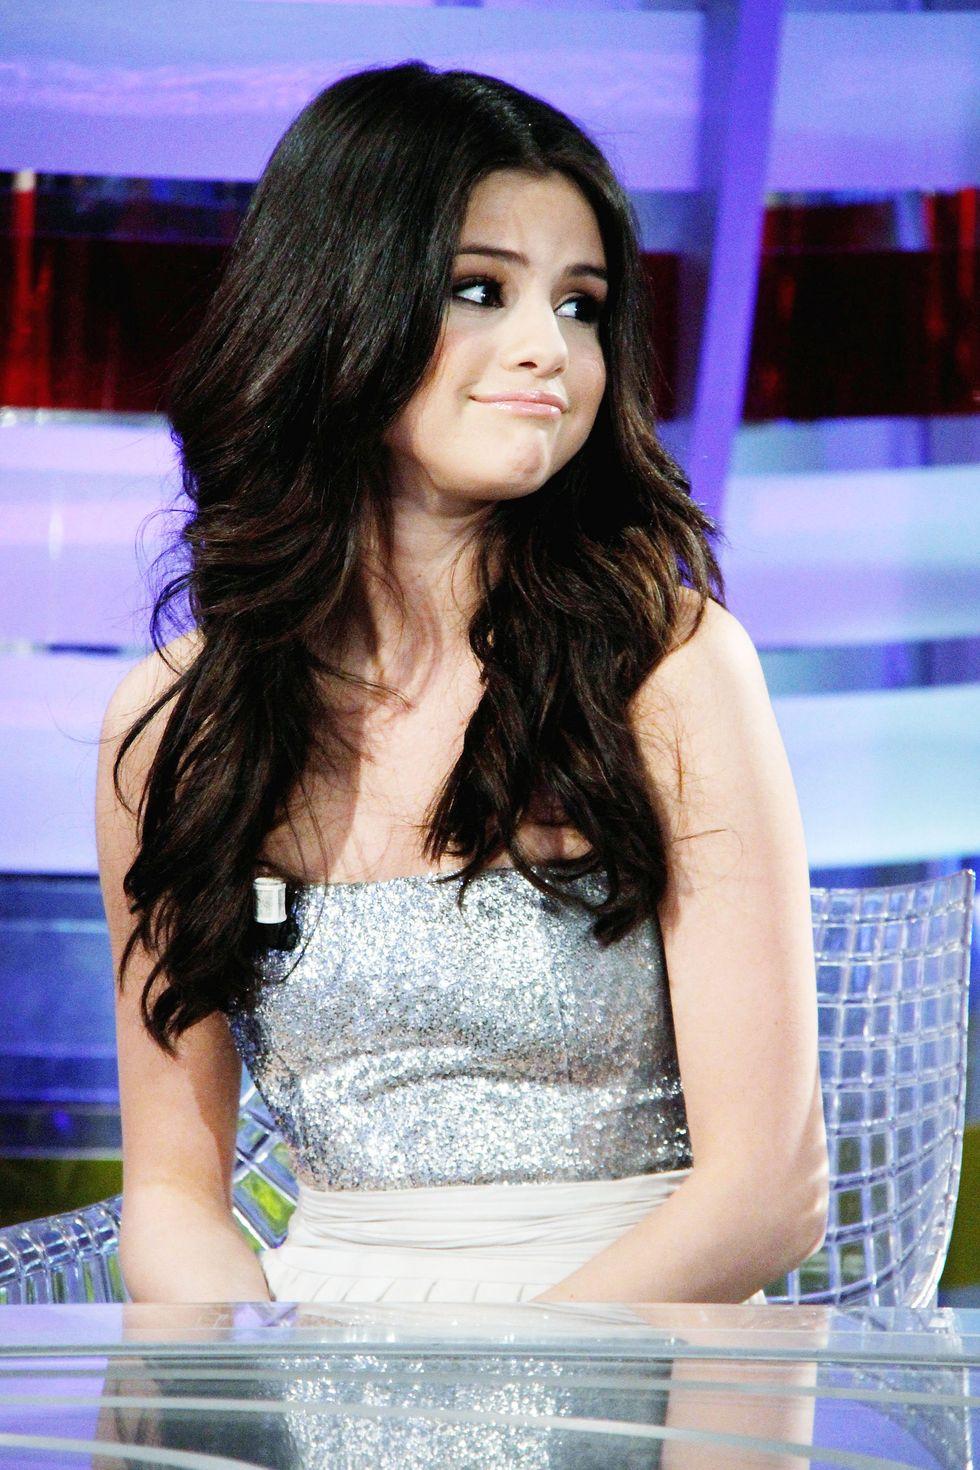 Selena Gomez 2010 : selena-gomez-el-hormiguero-tv-show-stills-hq-04